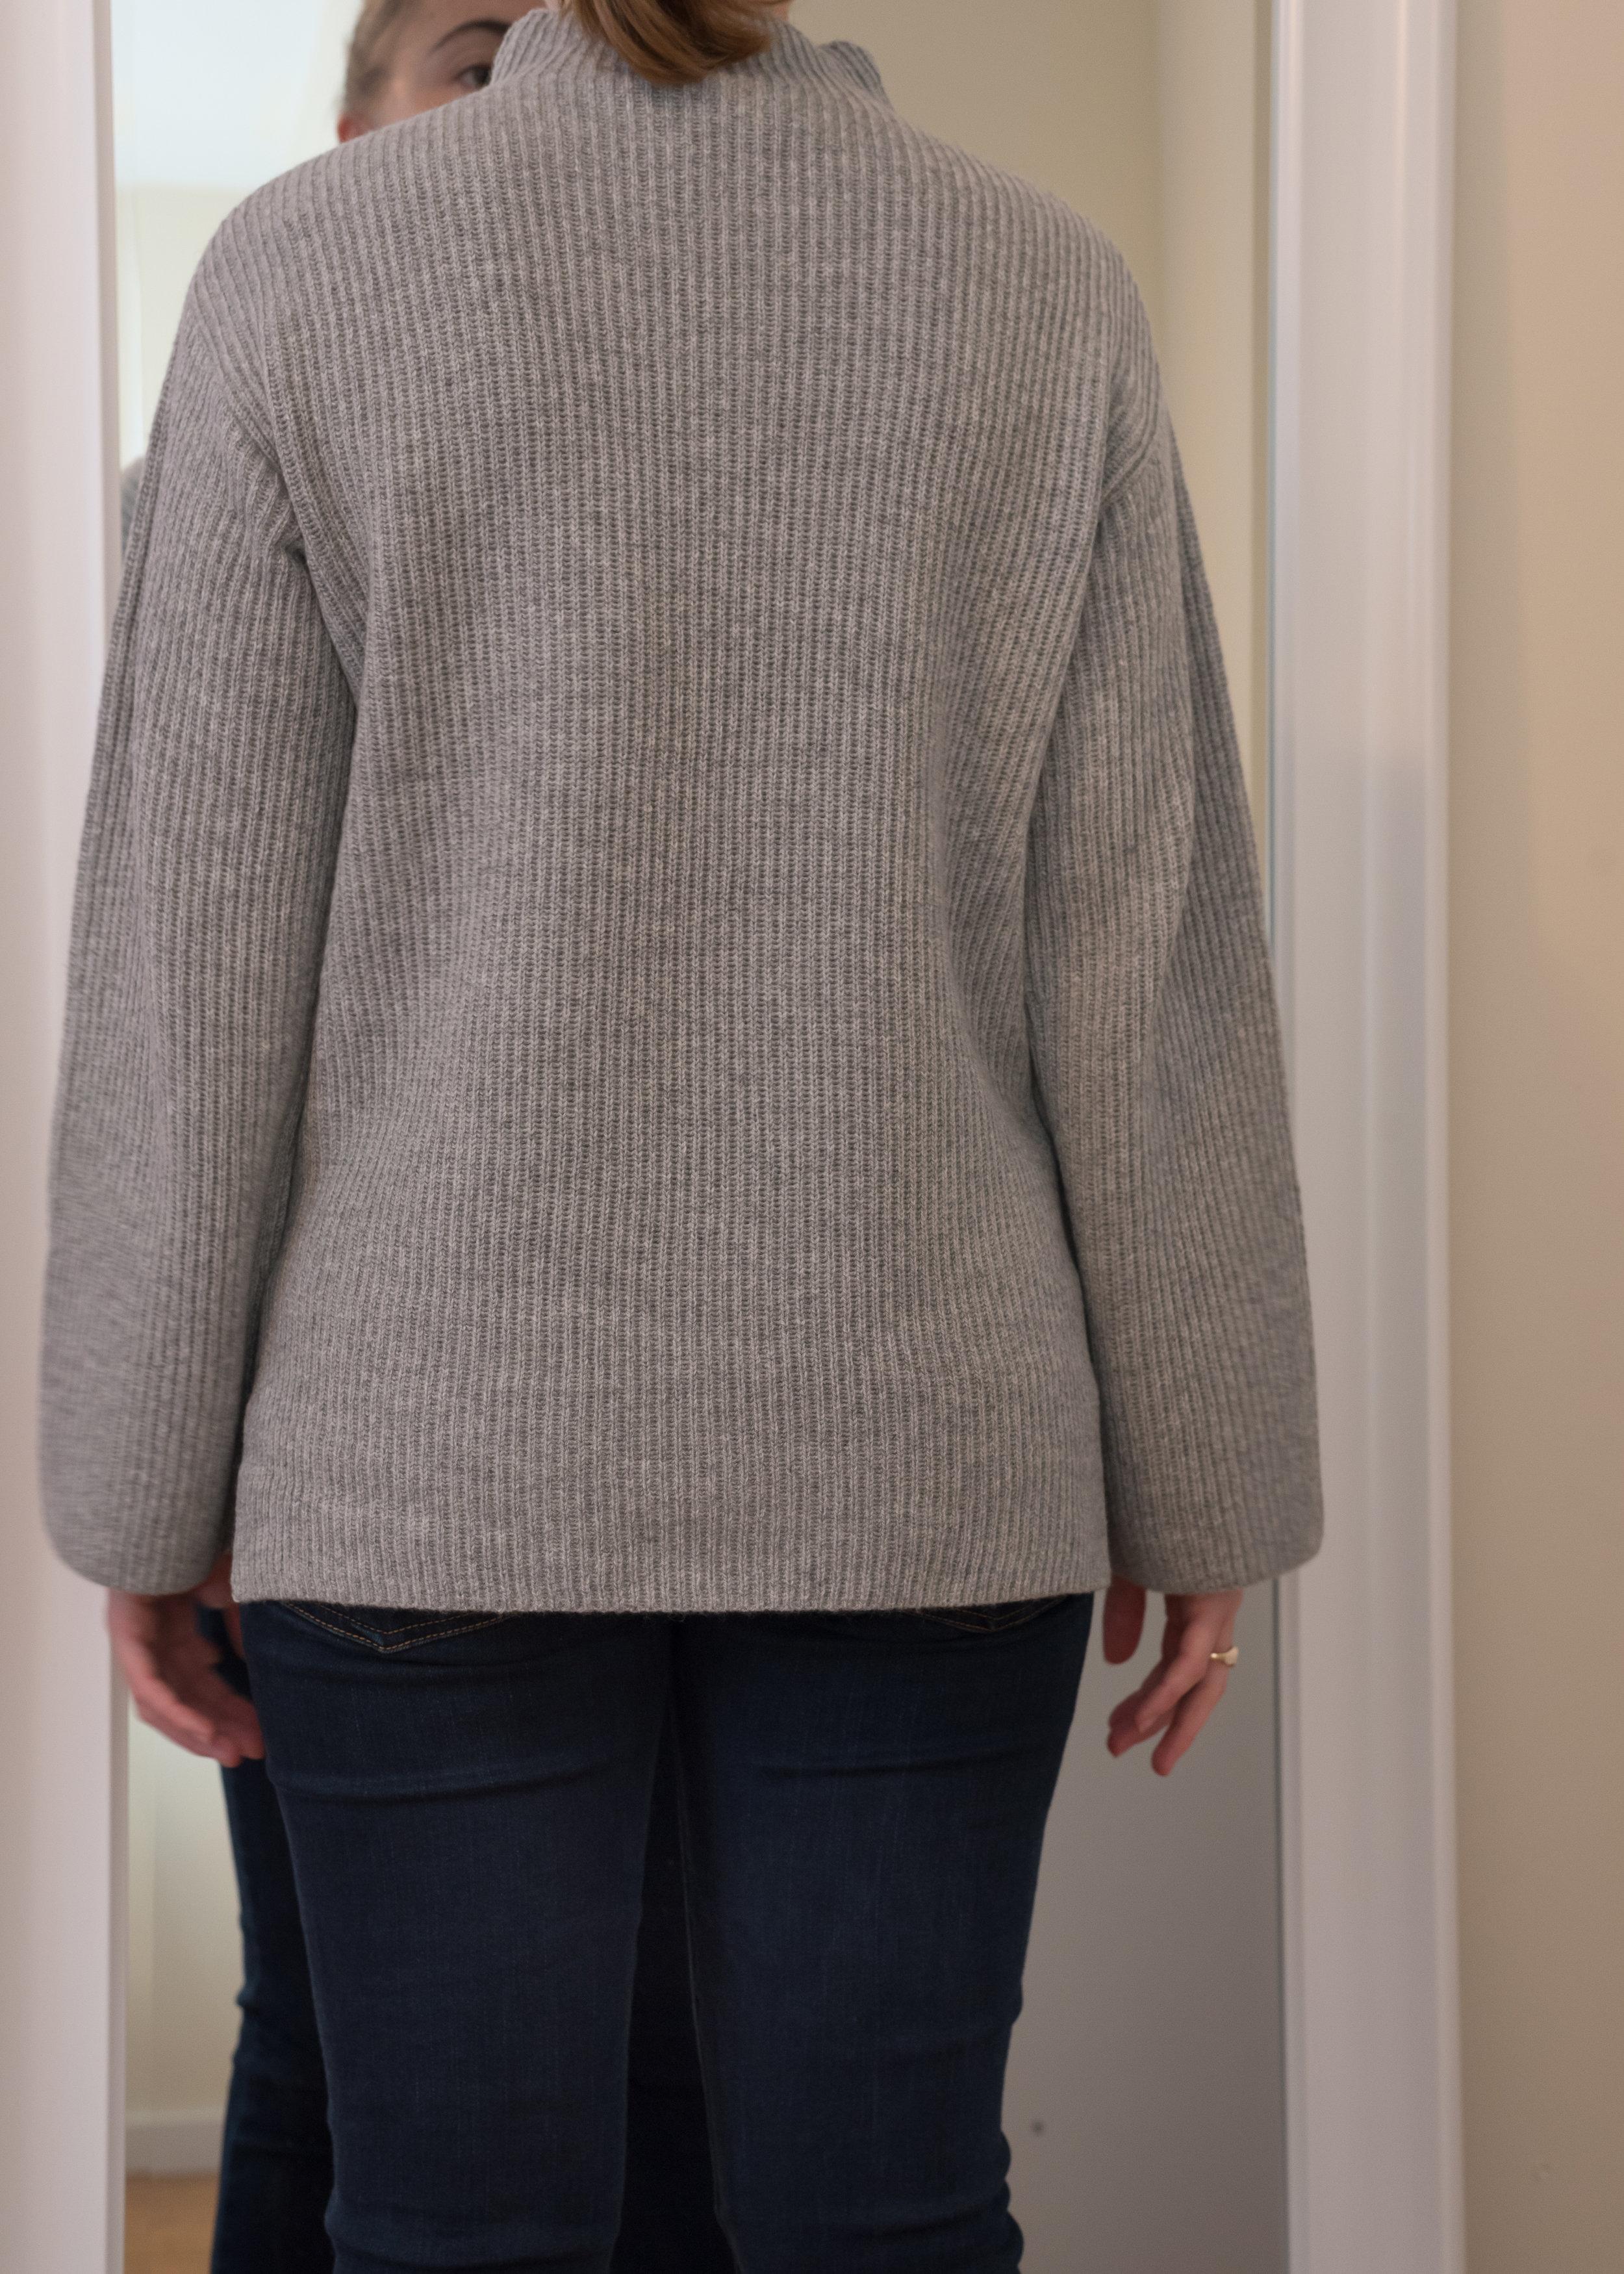 Everlane Cashmere Rib Mockneck Sweater - Size S - Back View